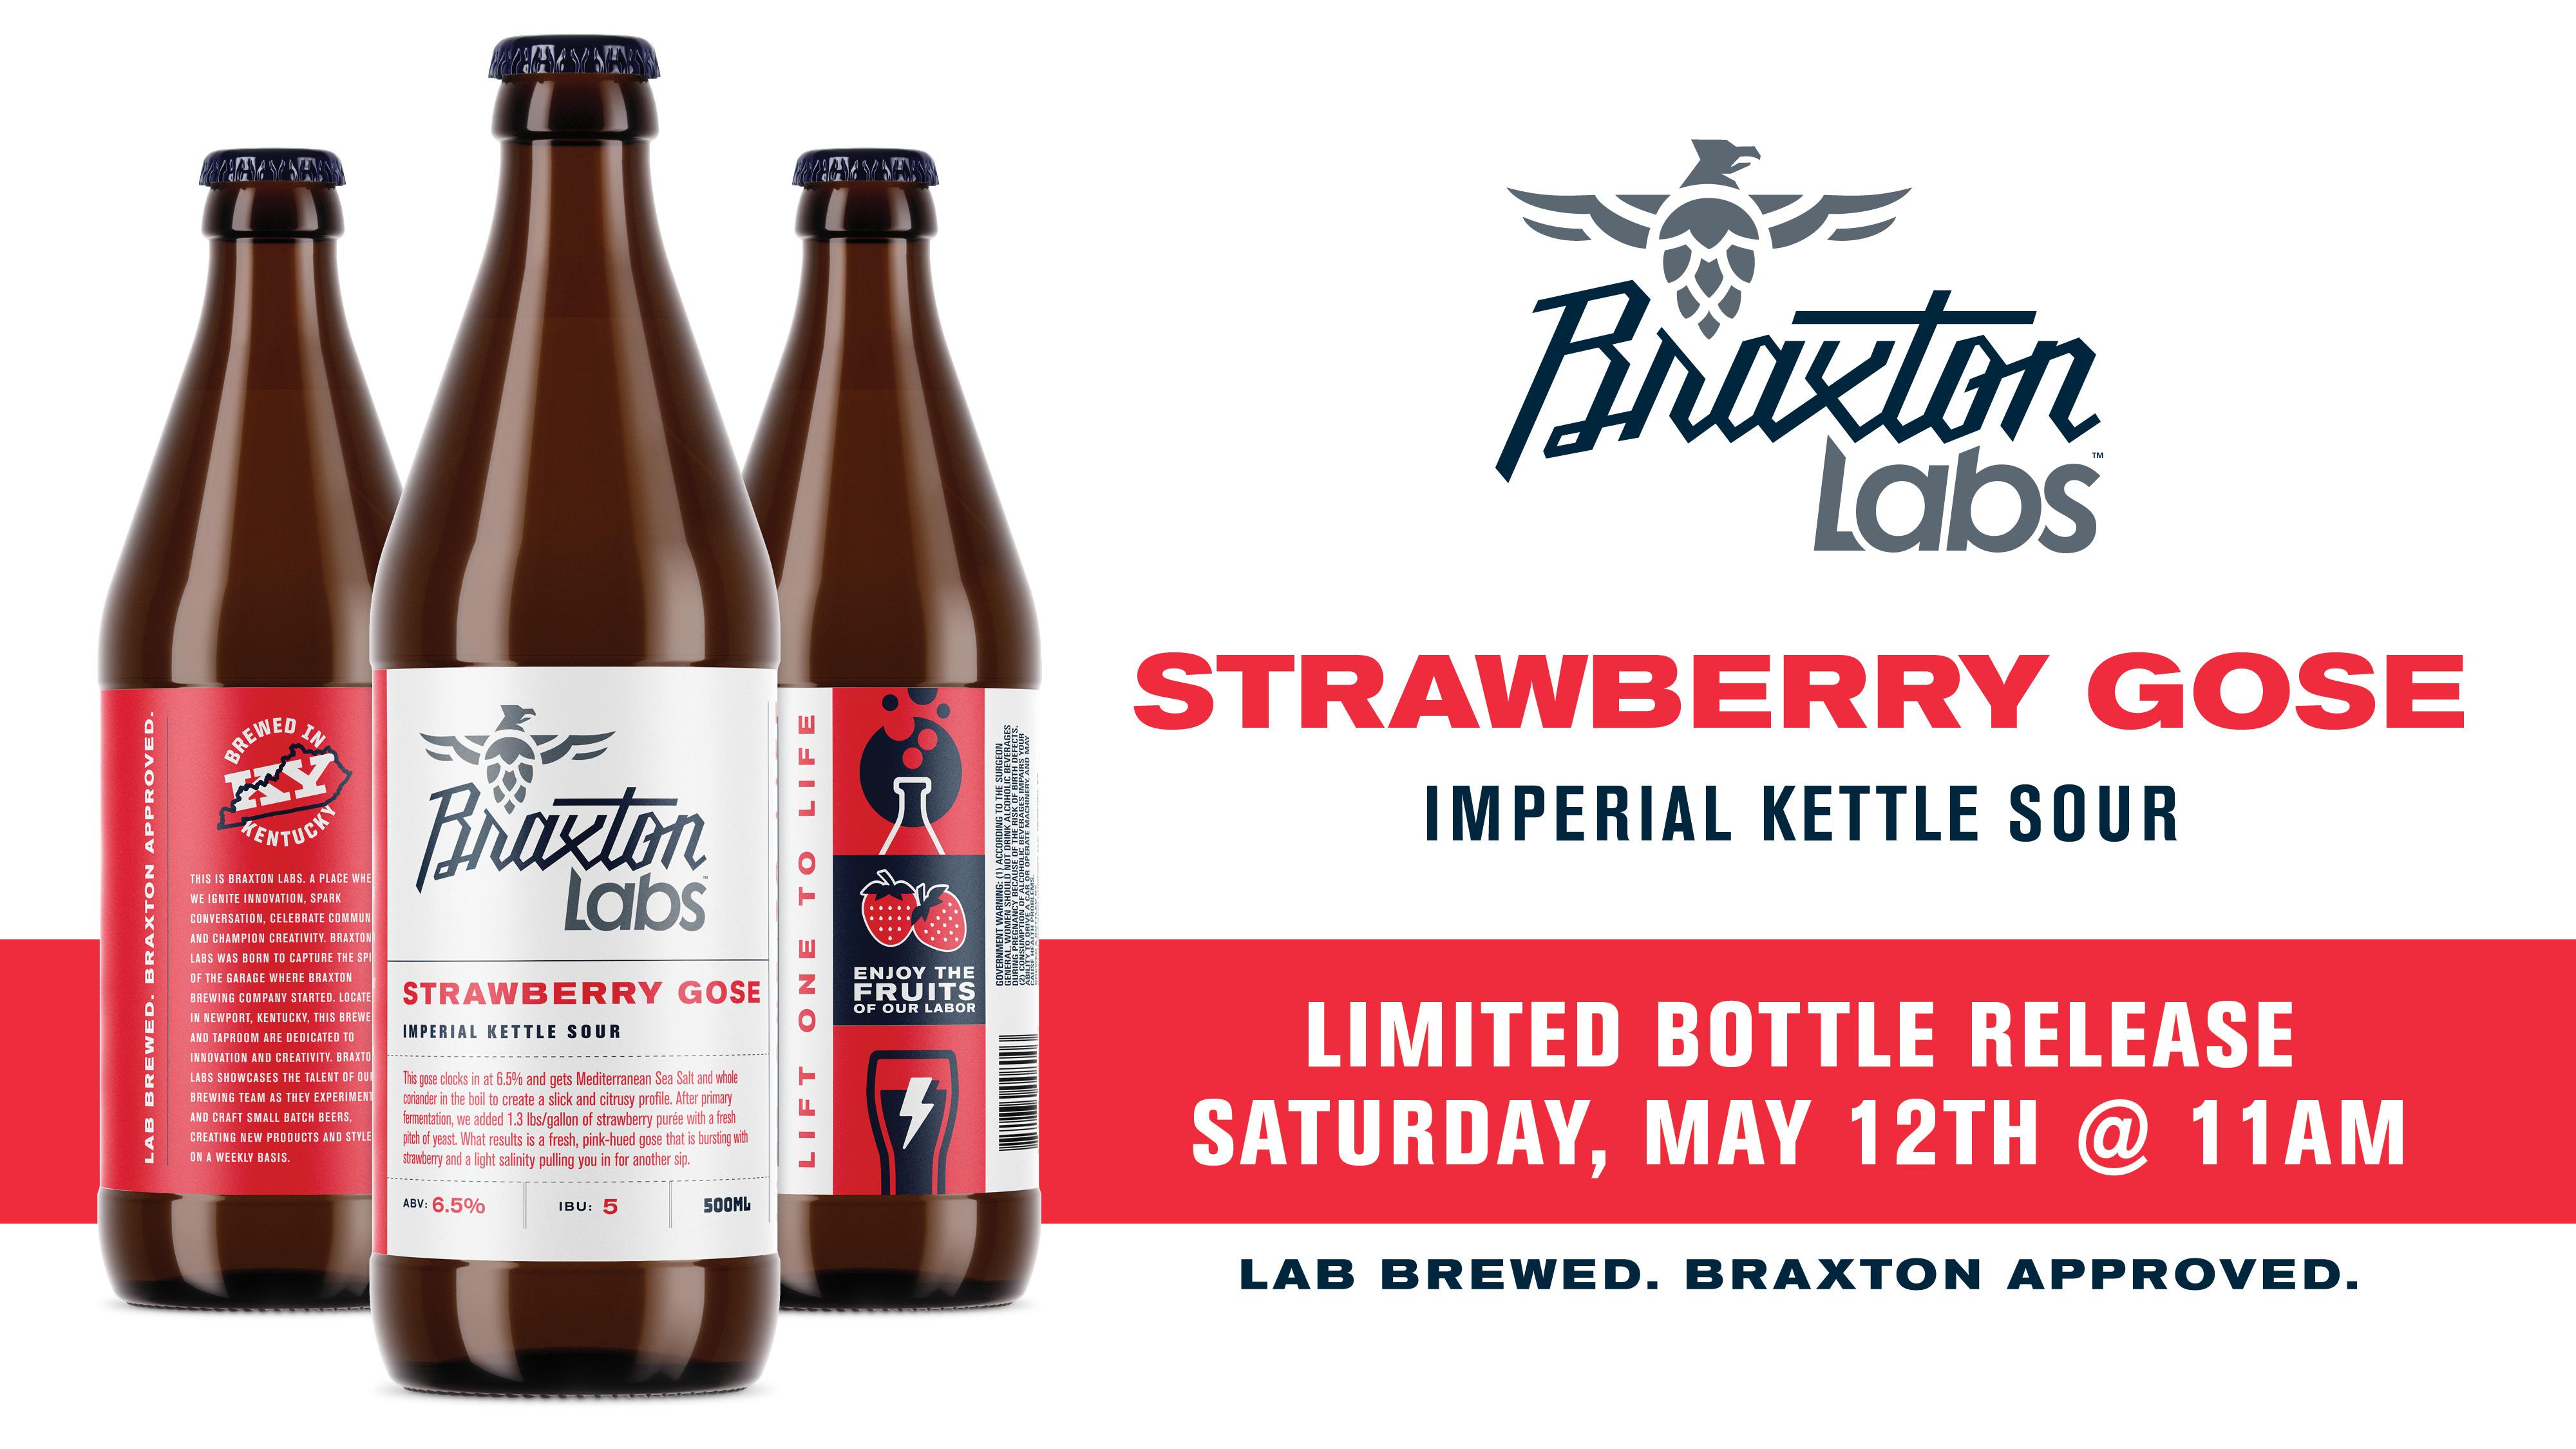 Braxton Labs Strawberry Gose